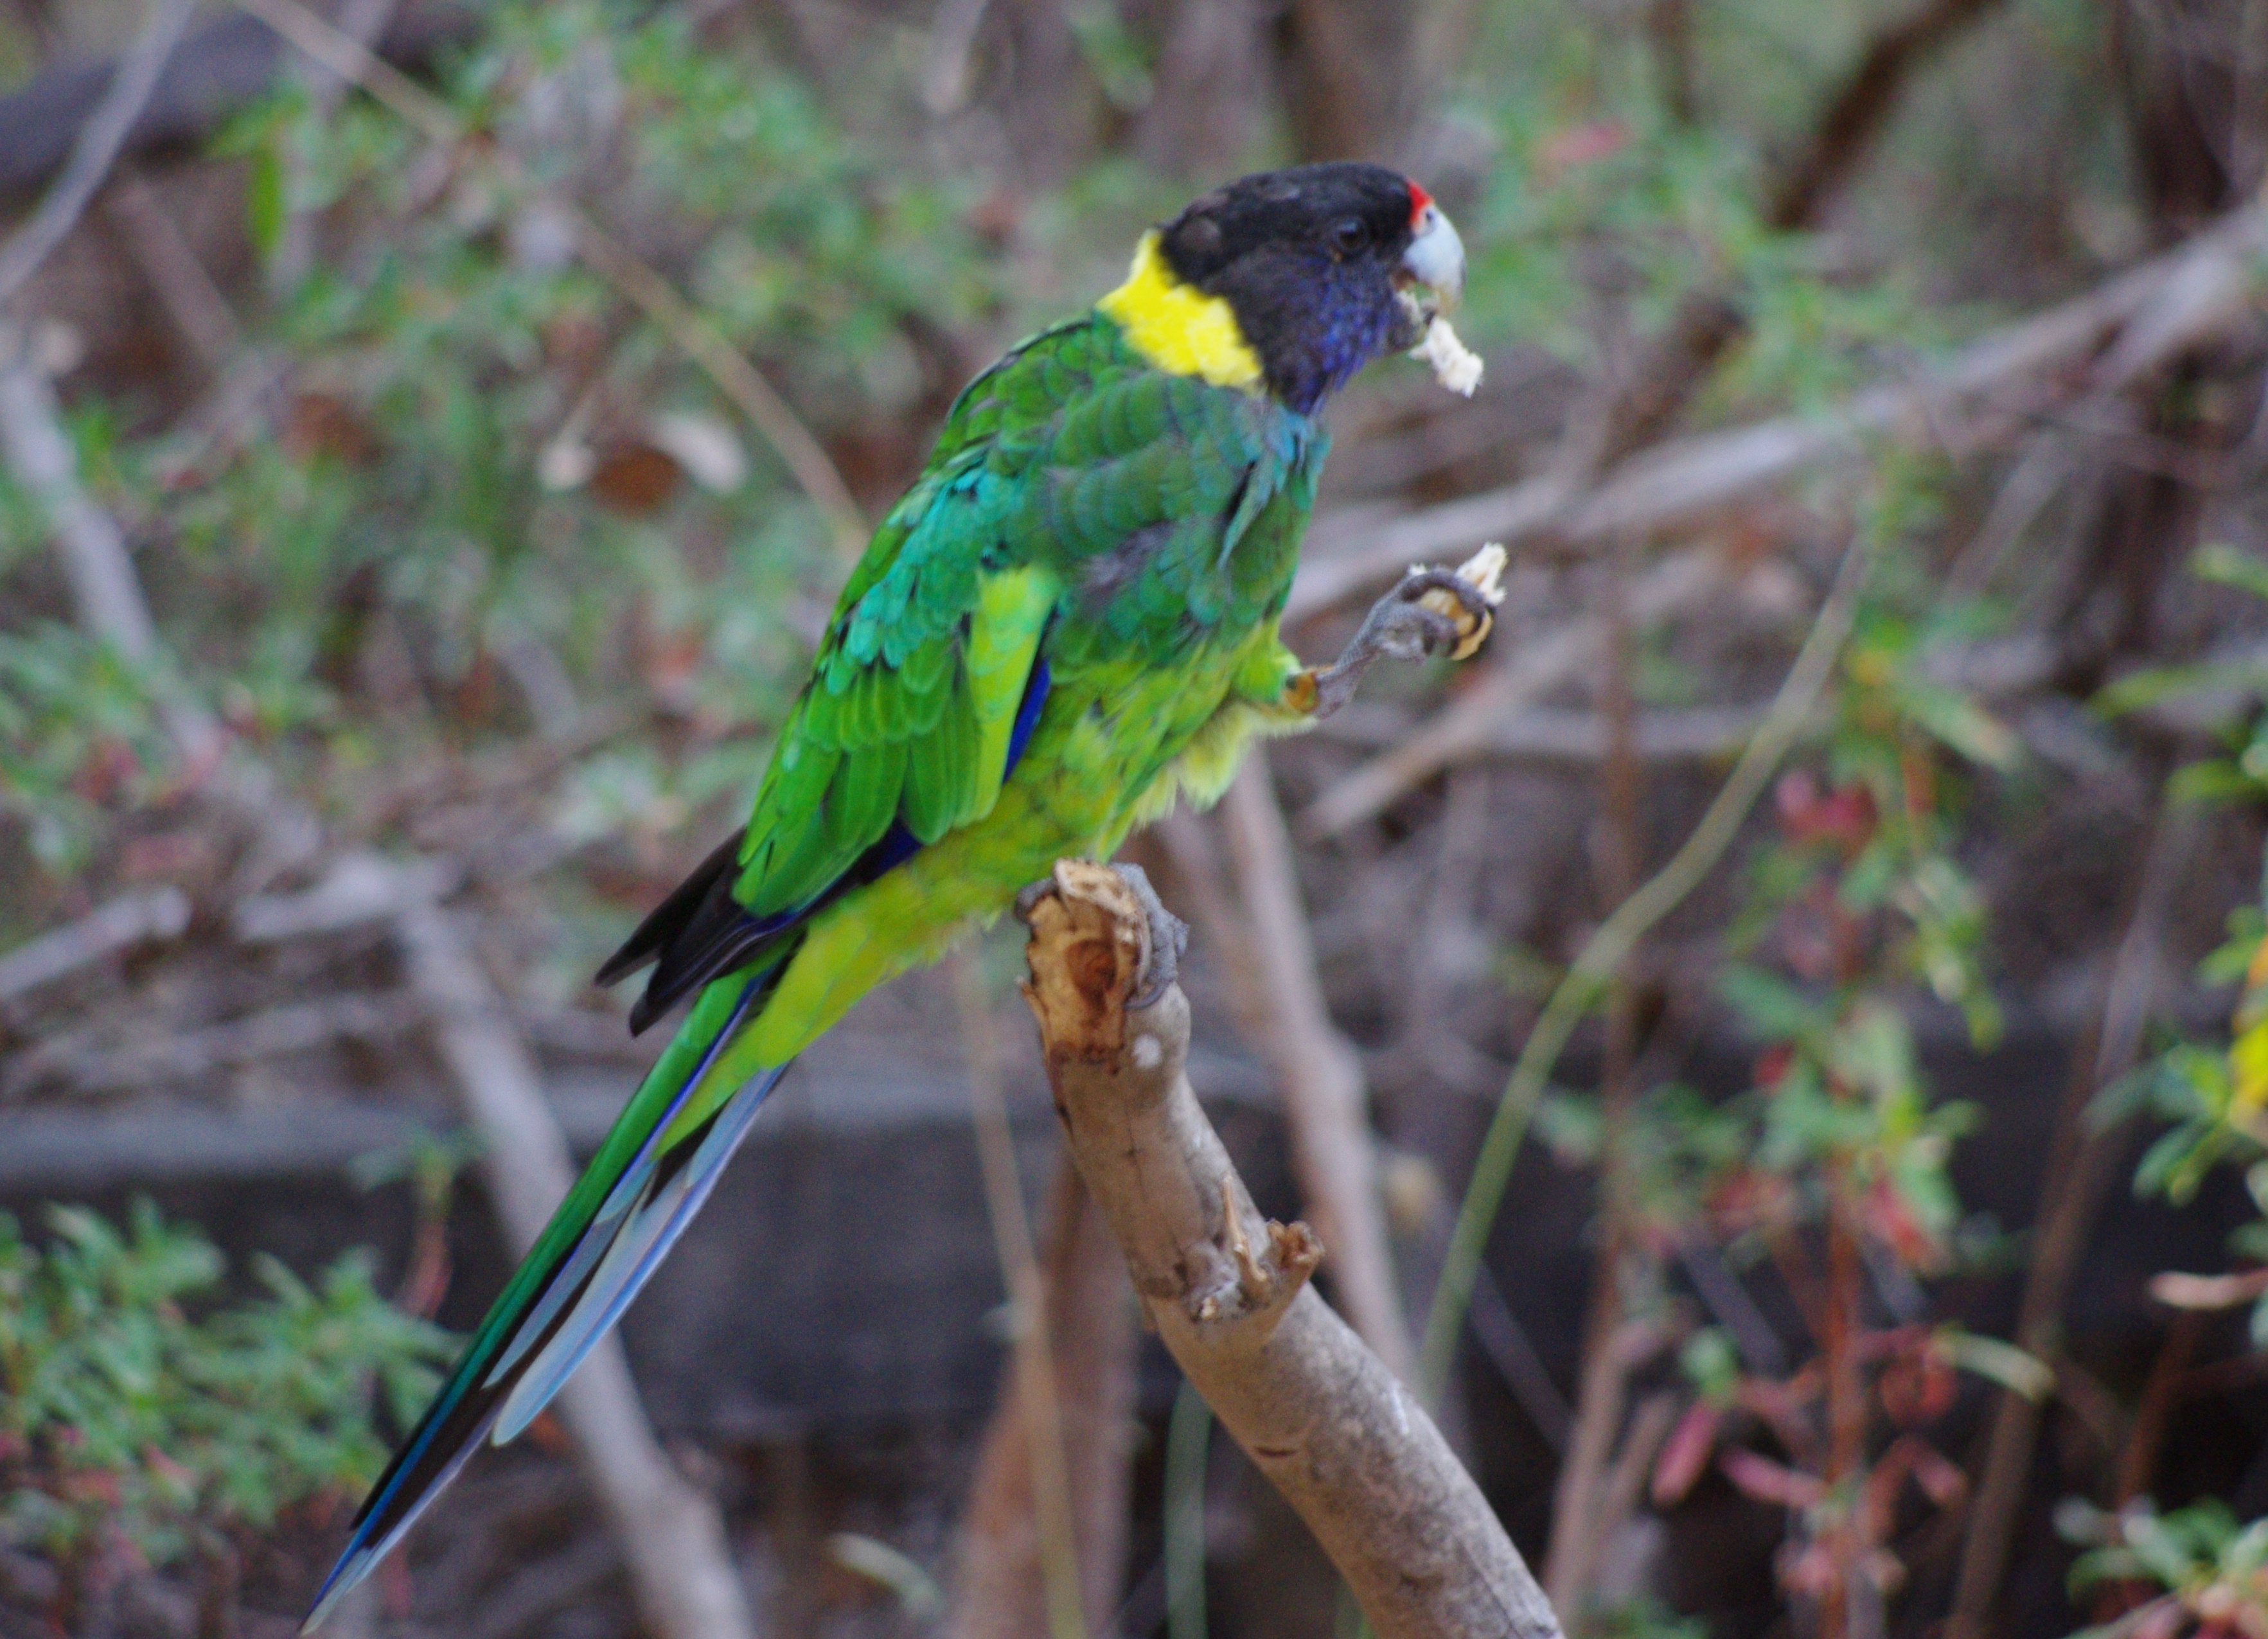 ... zonarius Gloucester National Park, Western Australia, Australia 8